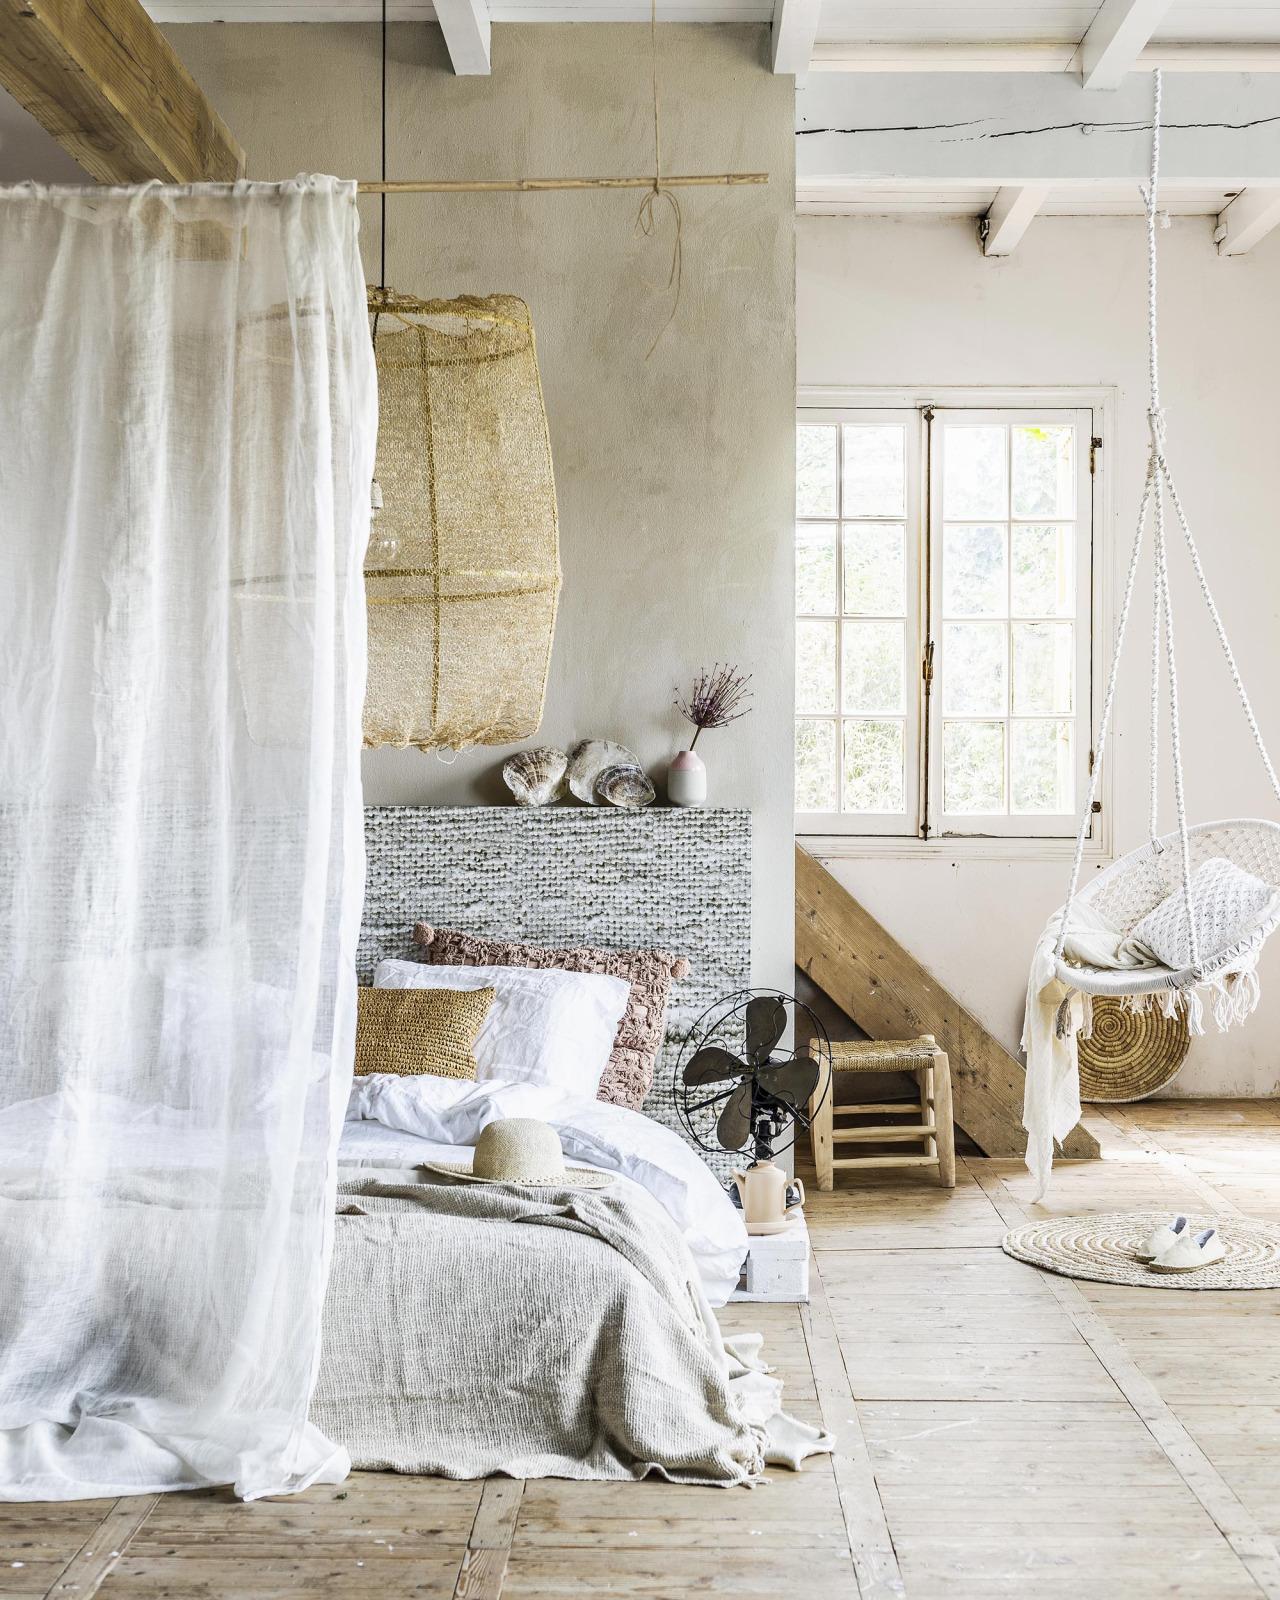 ibiza-bedroom-dreamy-640x800@2x